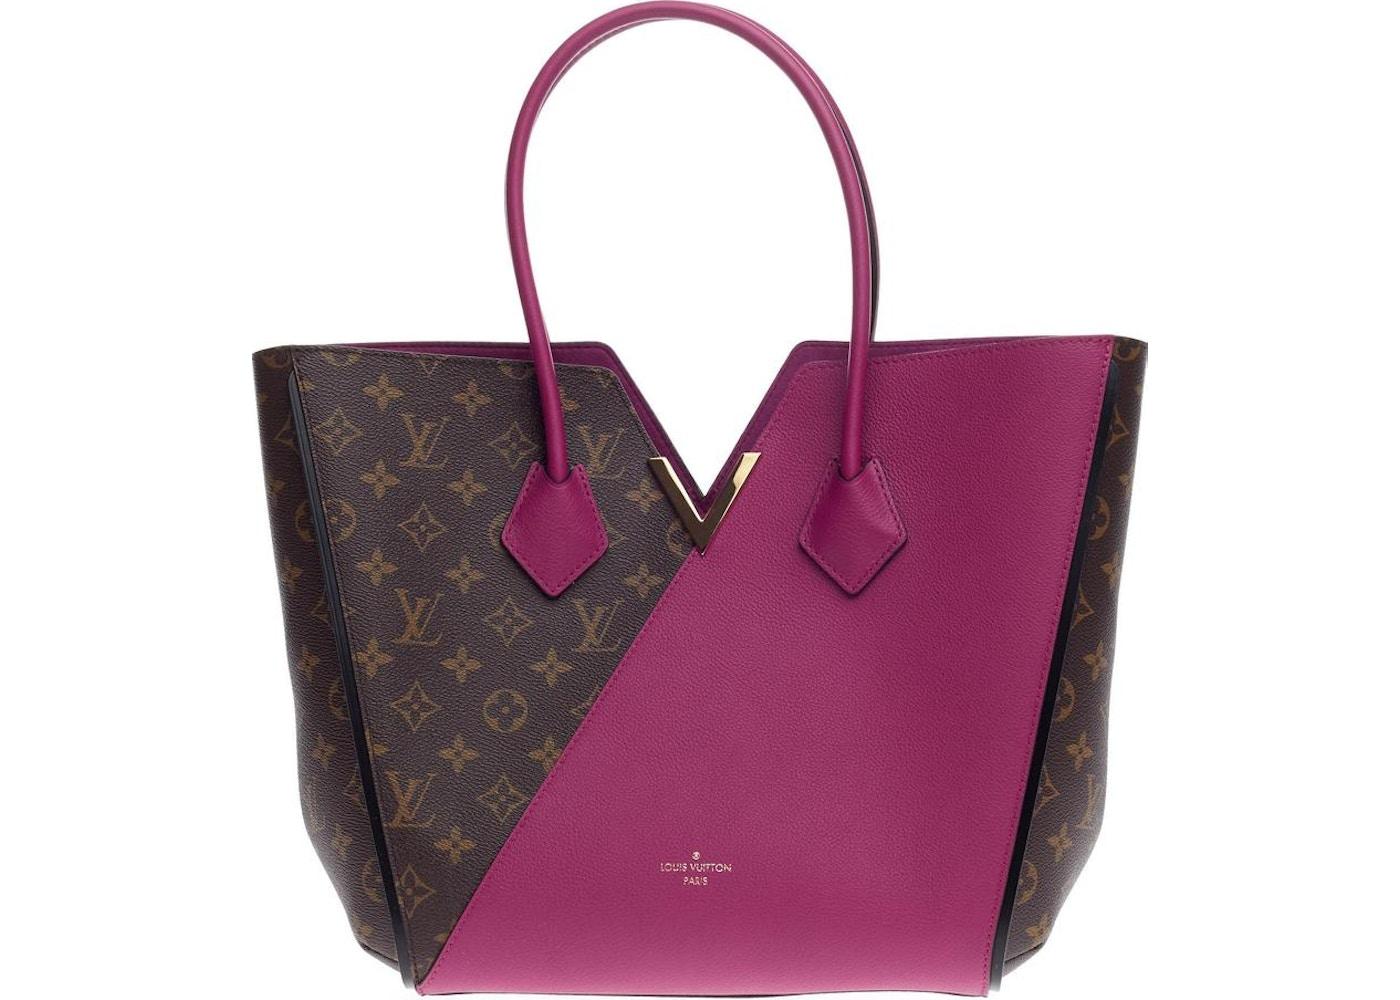 3bad6276a618 Louis Vuitton Tote Kimono Monogram Brown Grape Violet. Monogram Brown Grape  Violet